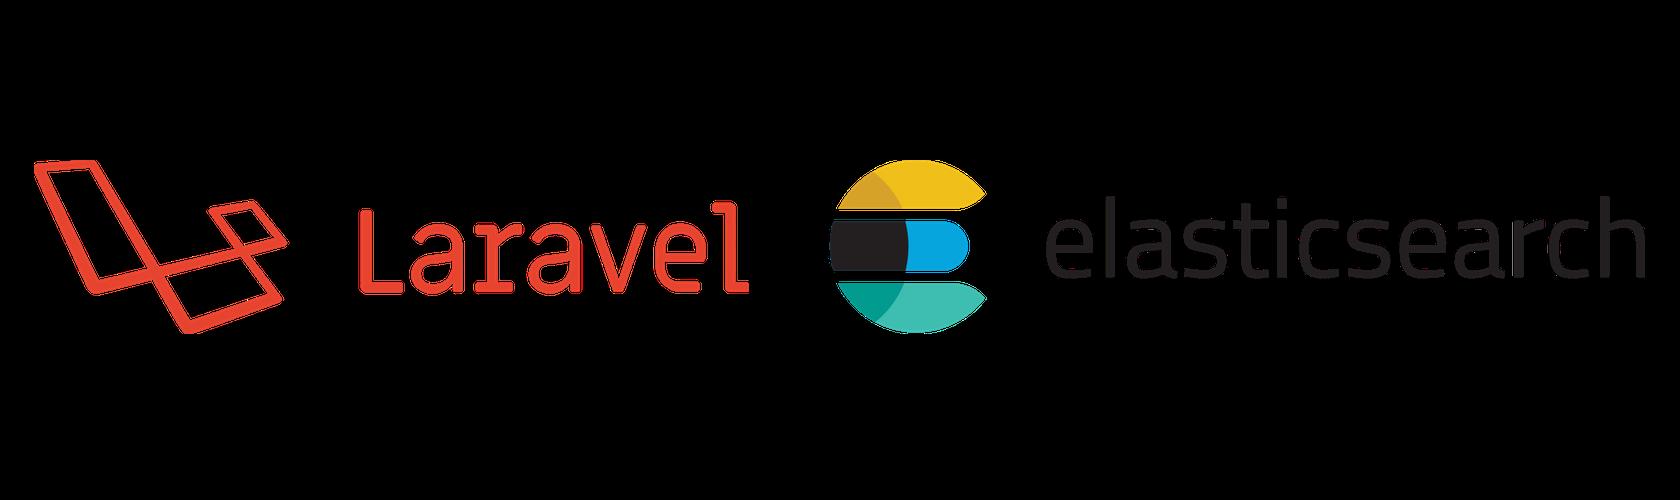 Easily Integrate ElasticSearch in Laravel Application